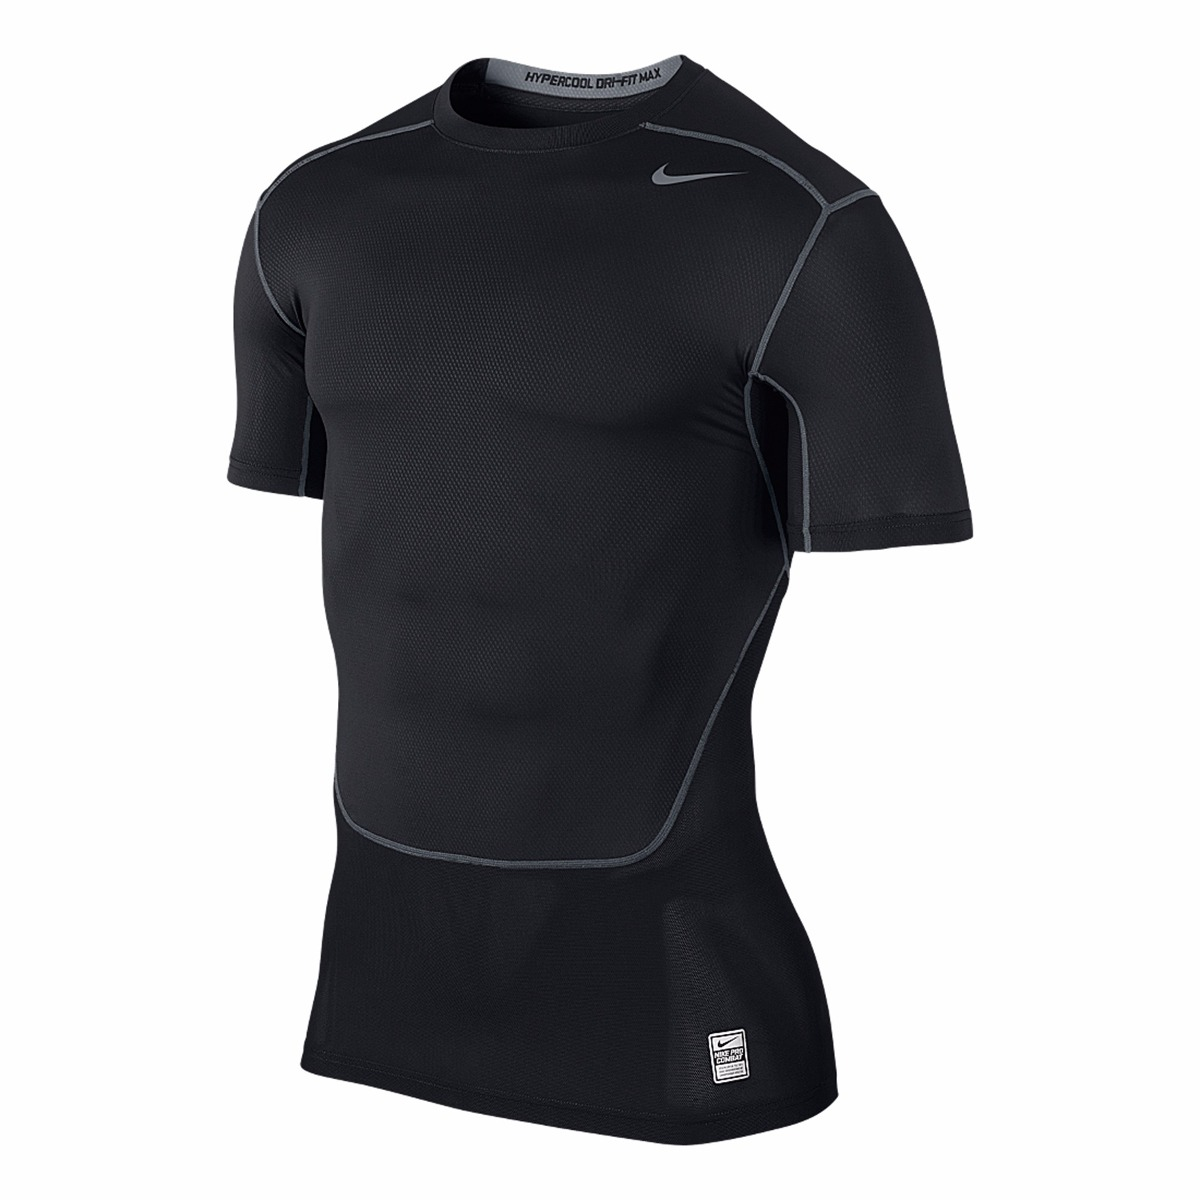 camiseta térmica nike pro combat hypercool tam gg v2mshop. Carregando zoom. 74af6399e8848